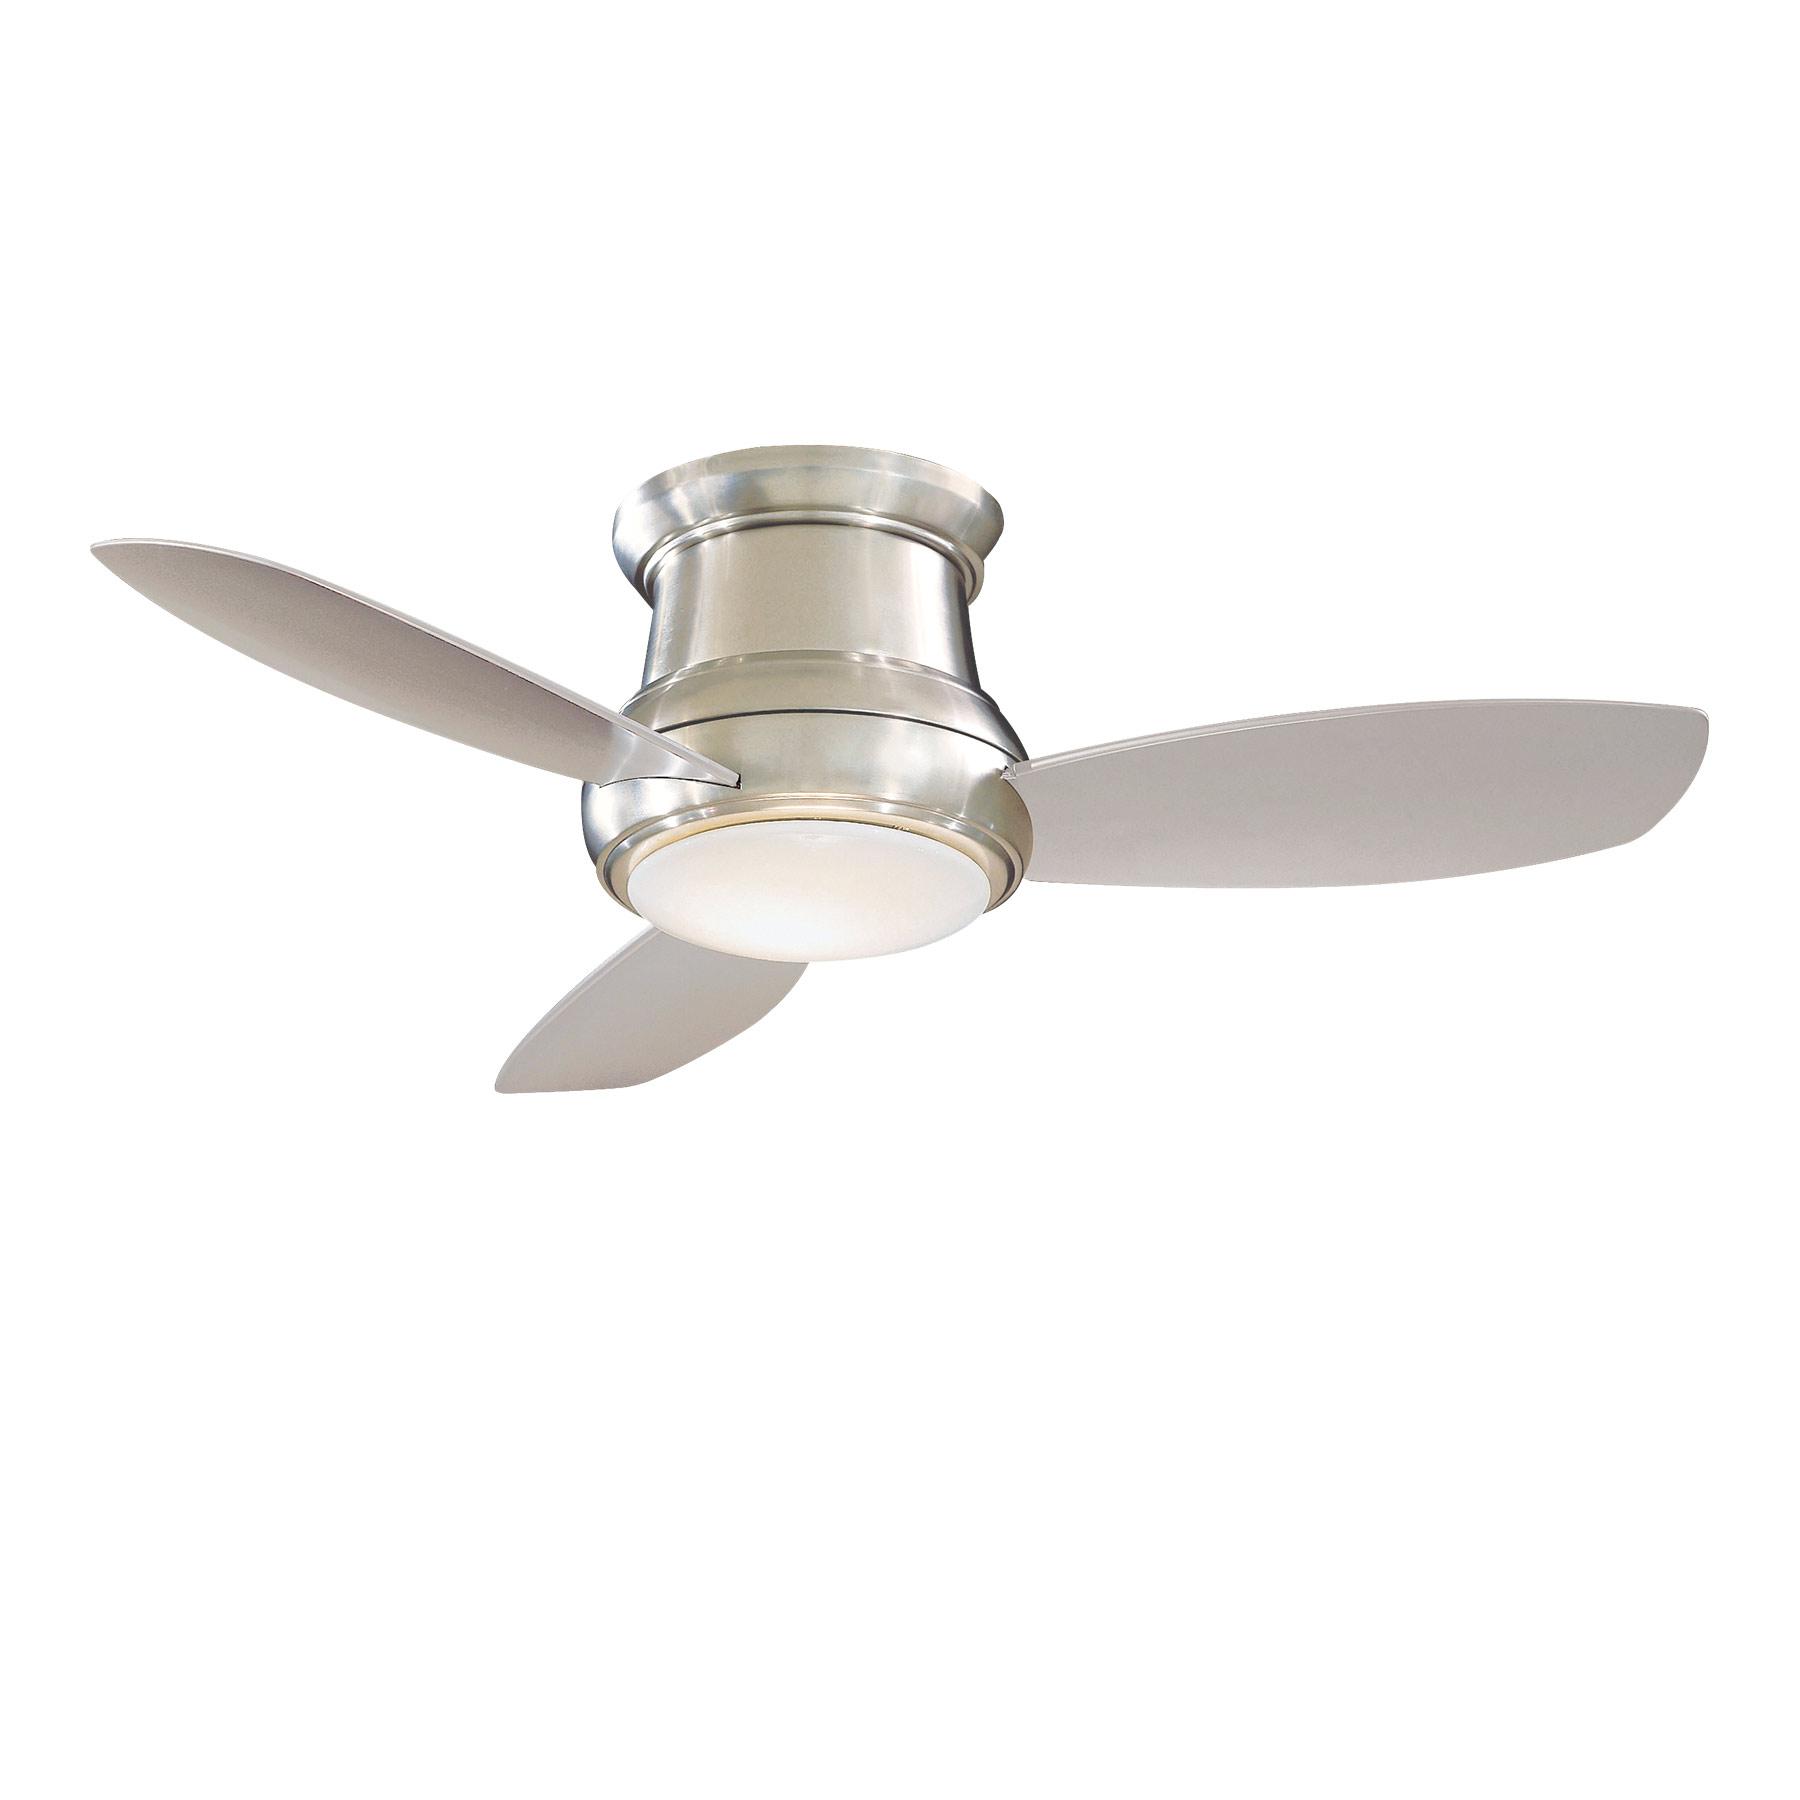 Concept ii ceiling fan led by minka aire f518l bn aloadofball Choice Image